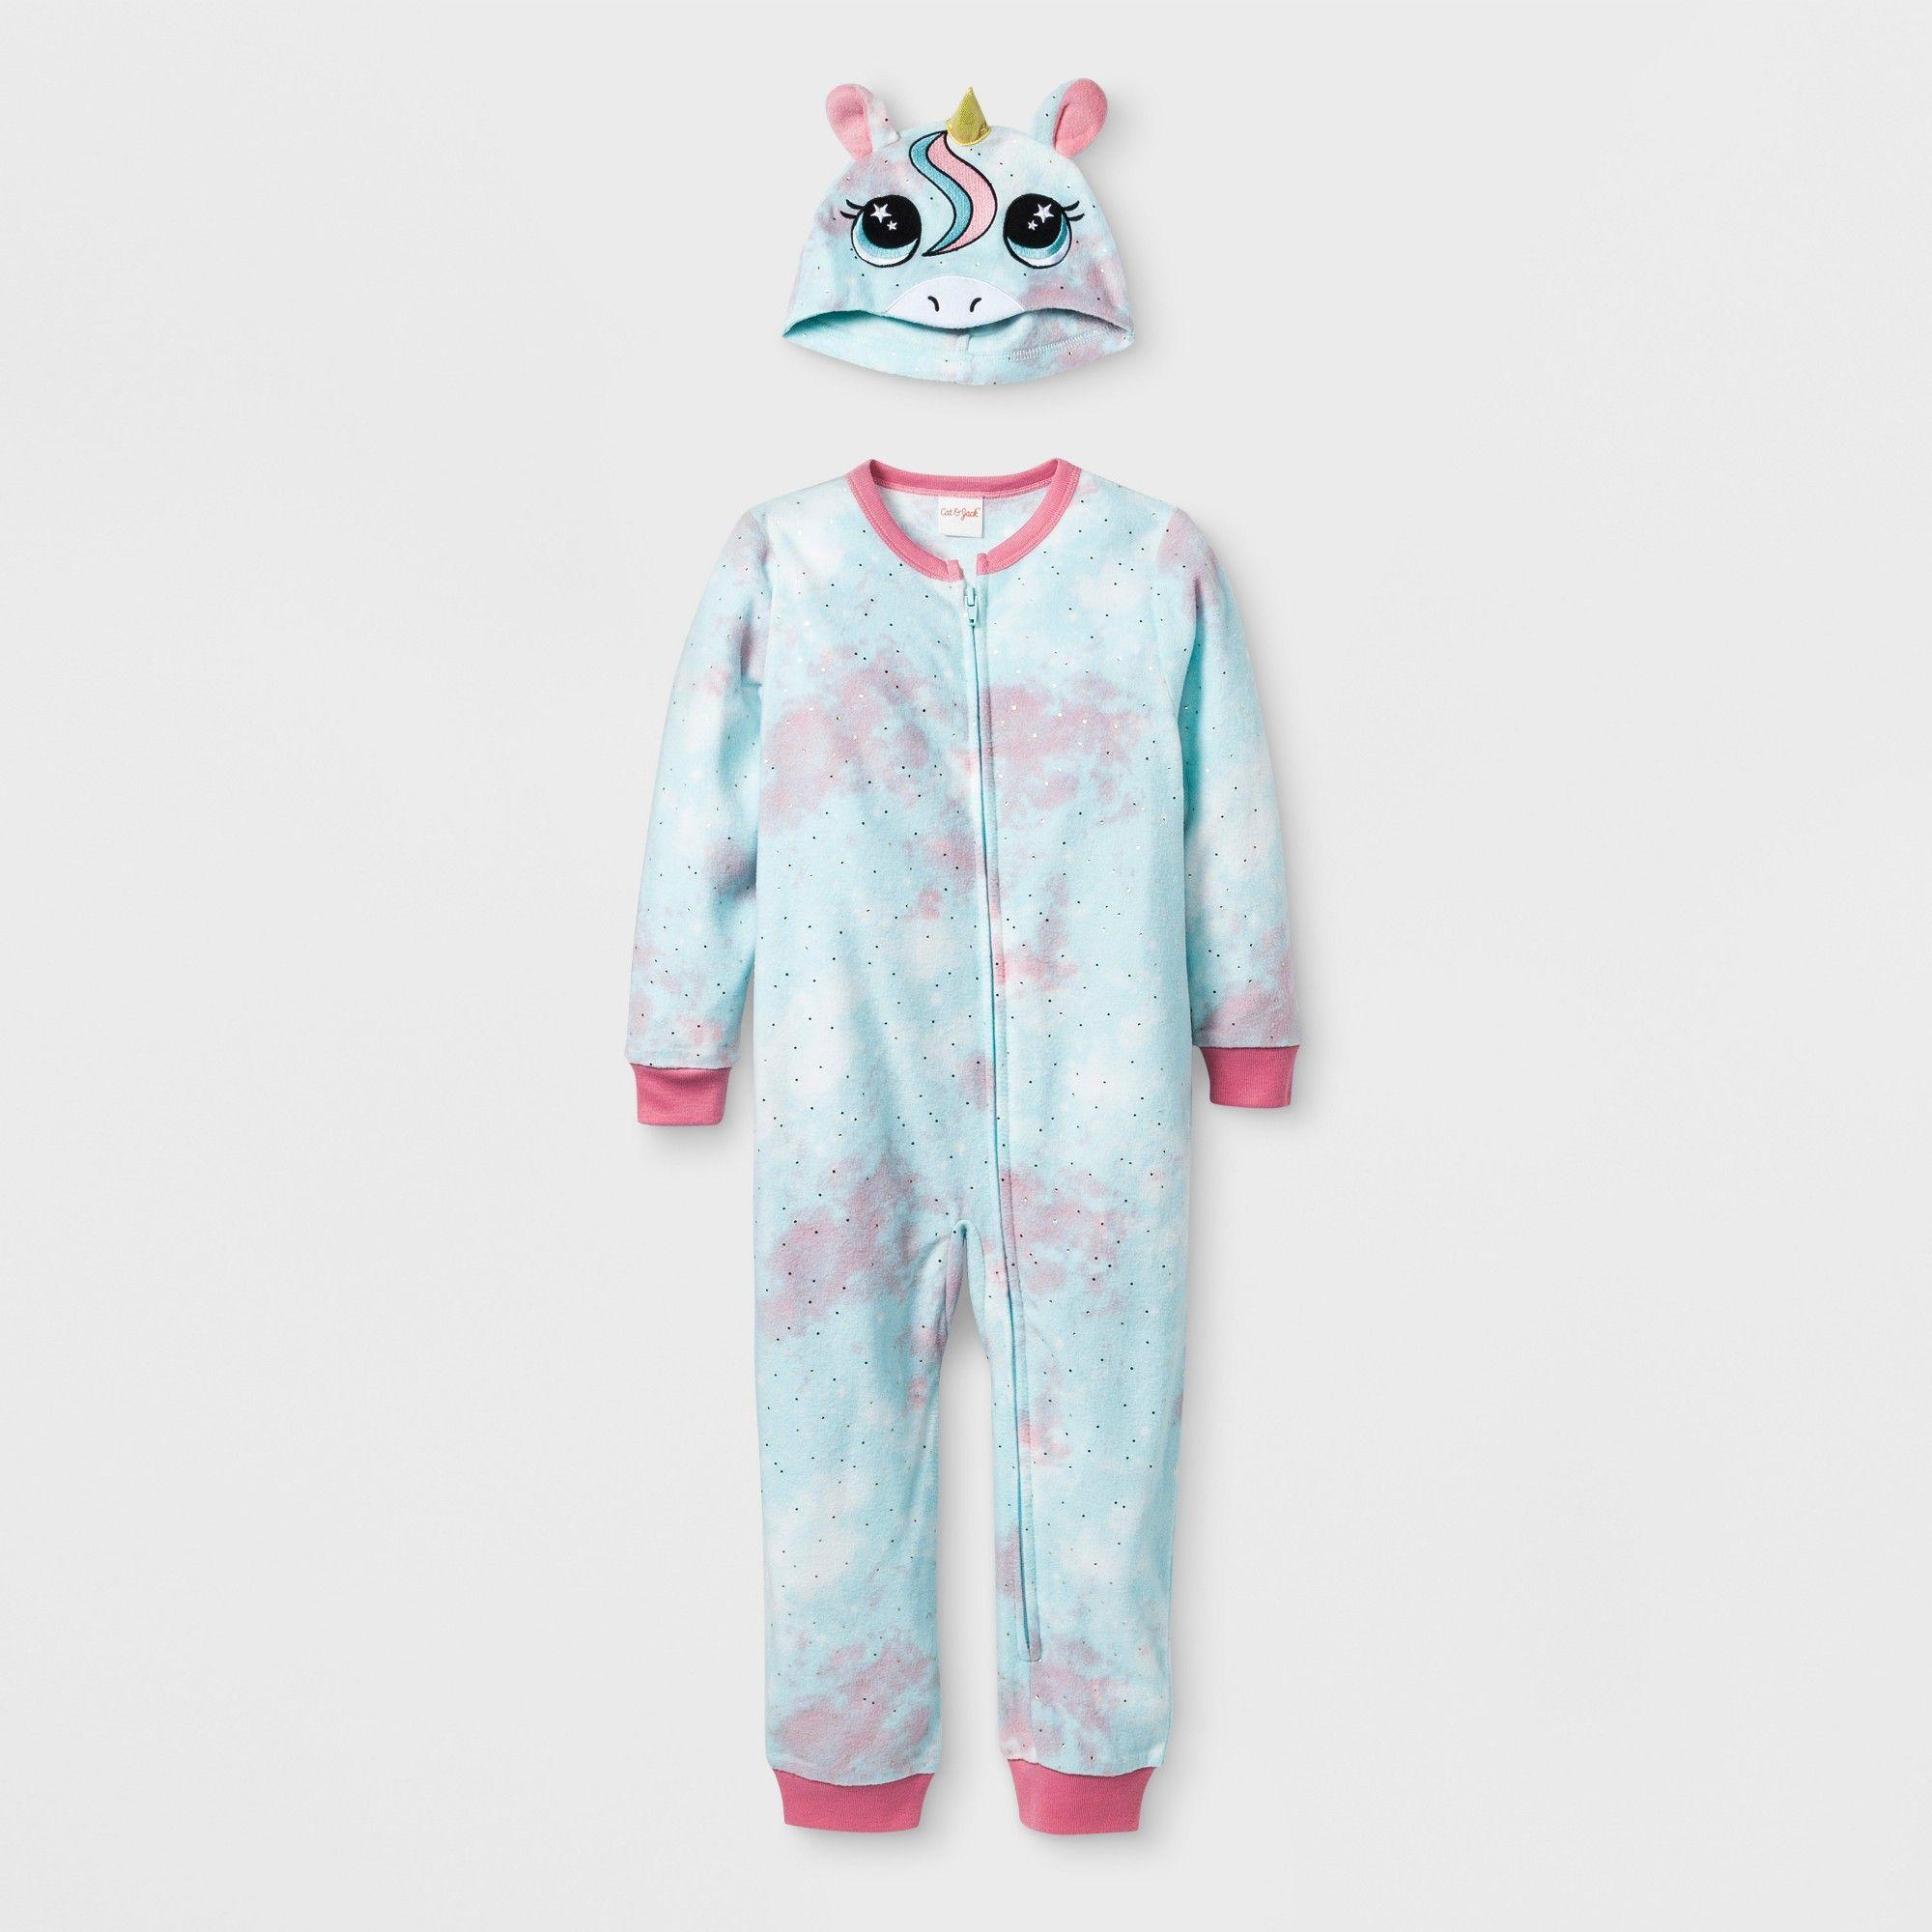 Toddler Girls  Unicorn Blanket Sleeper - Cat   Jack Pleasant Turquoise 4T 3123ca053